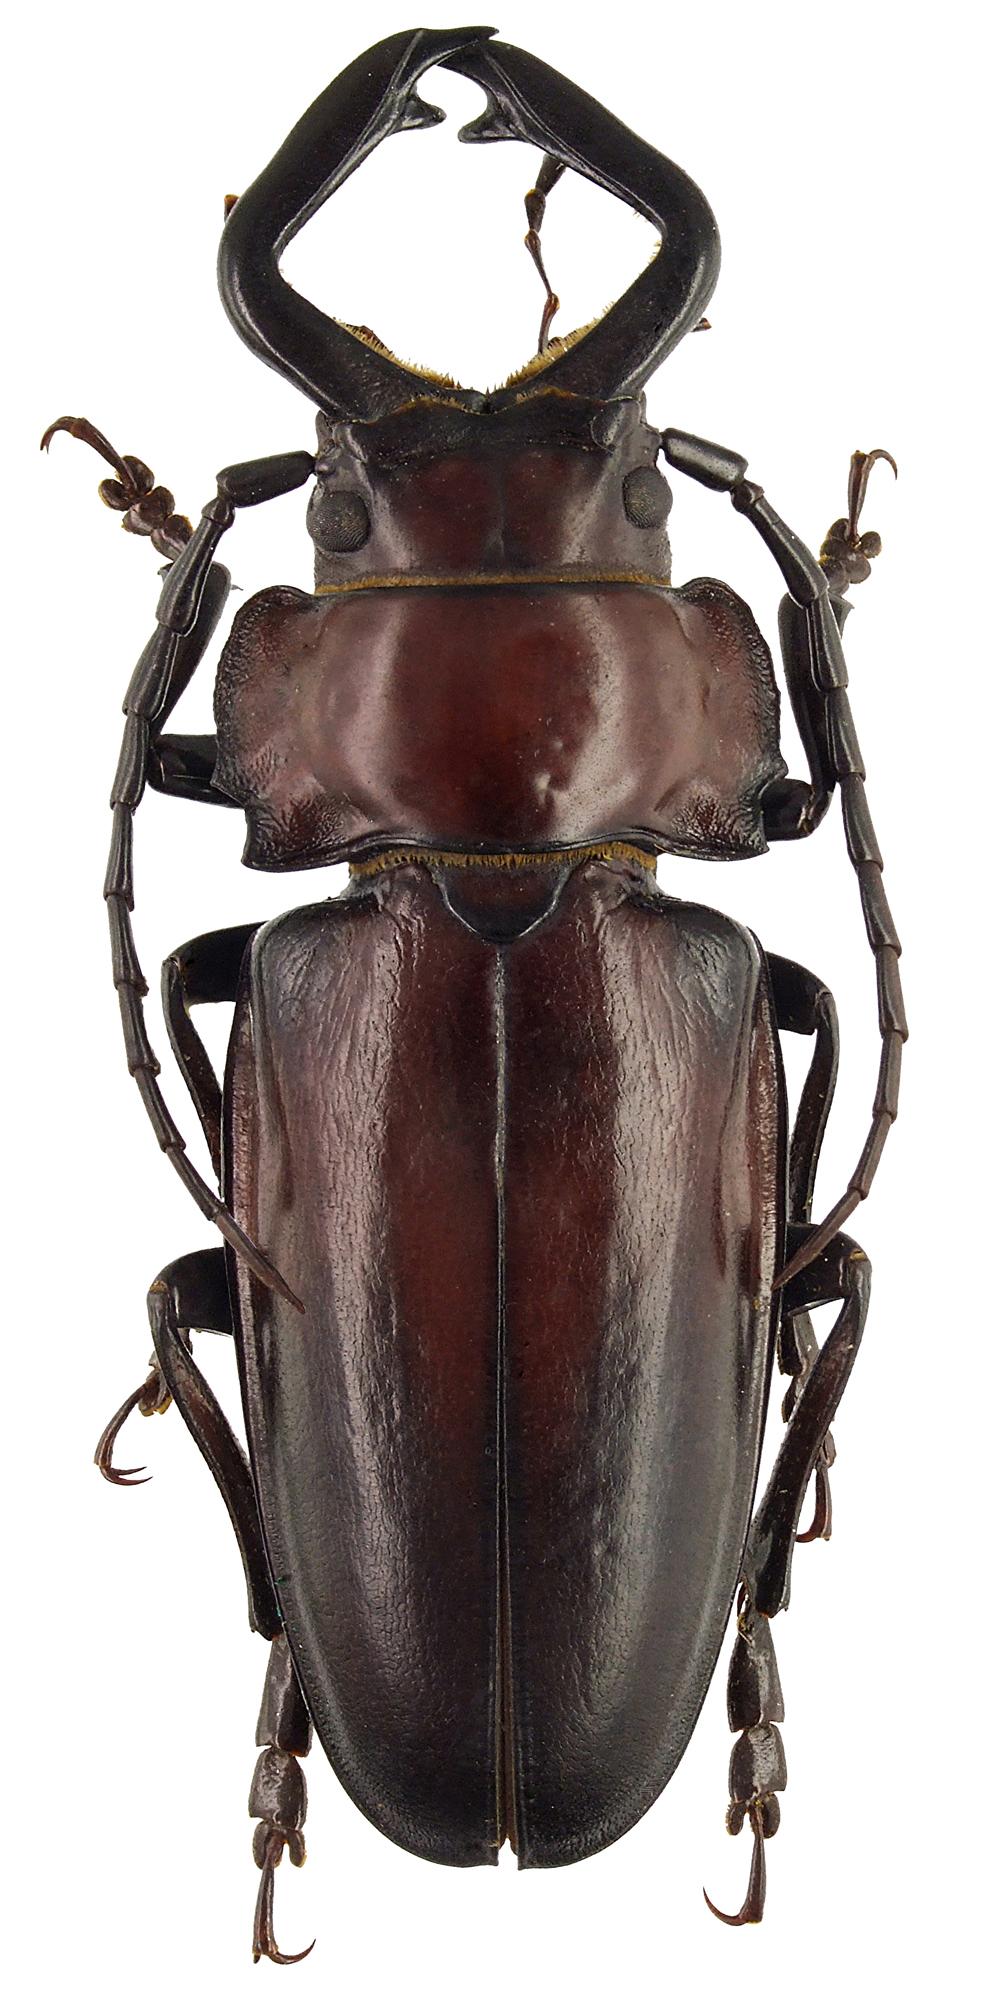 Notophysis forcipata 47284cz88.jpg